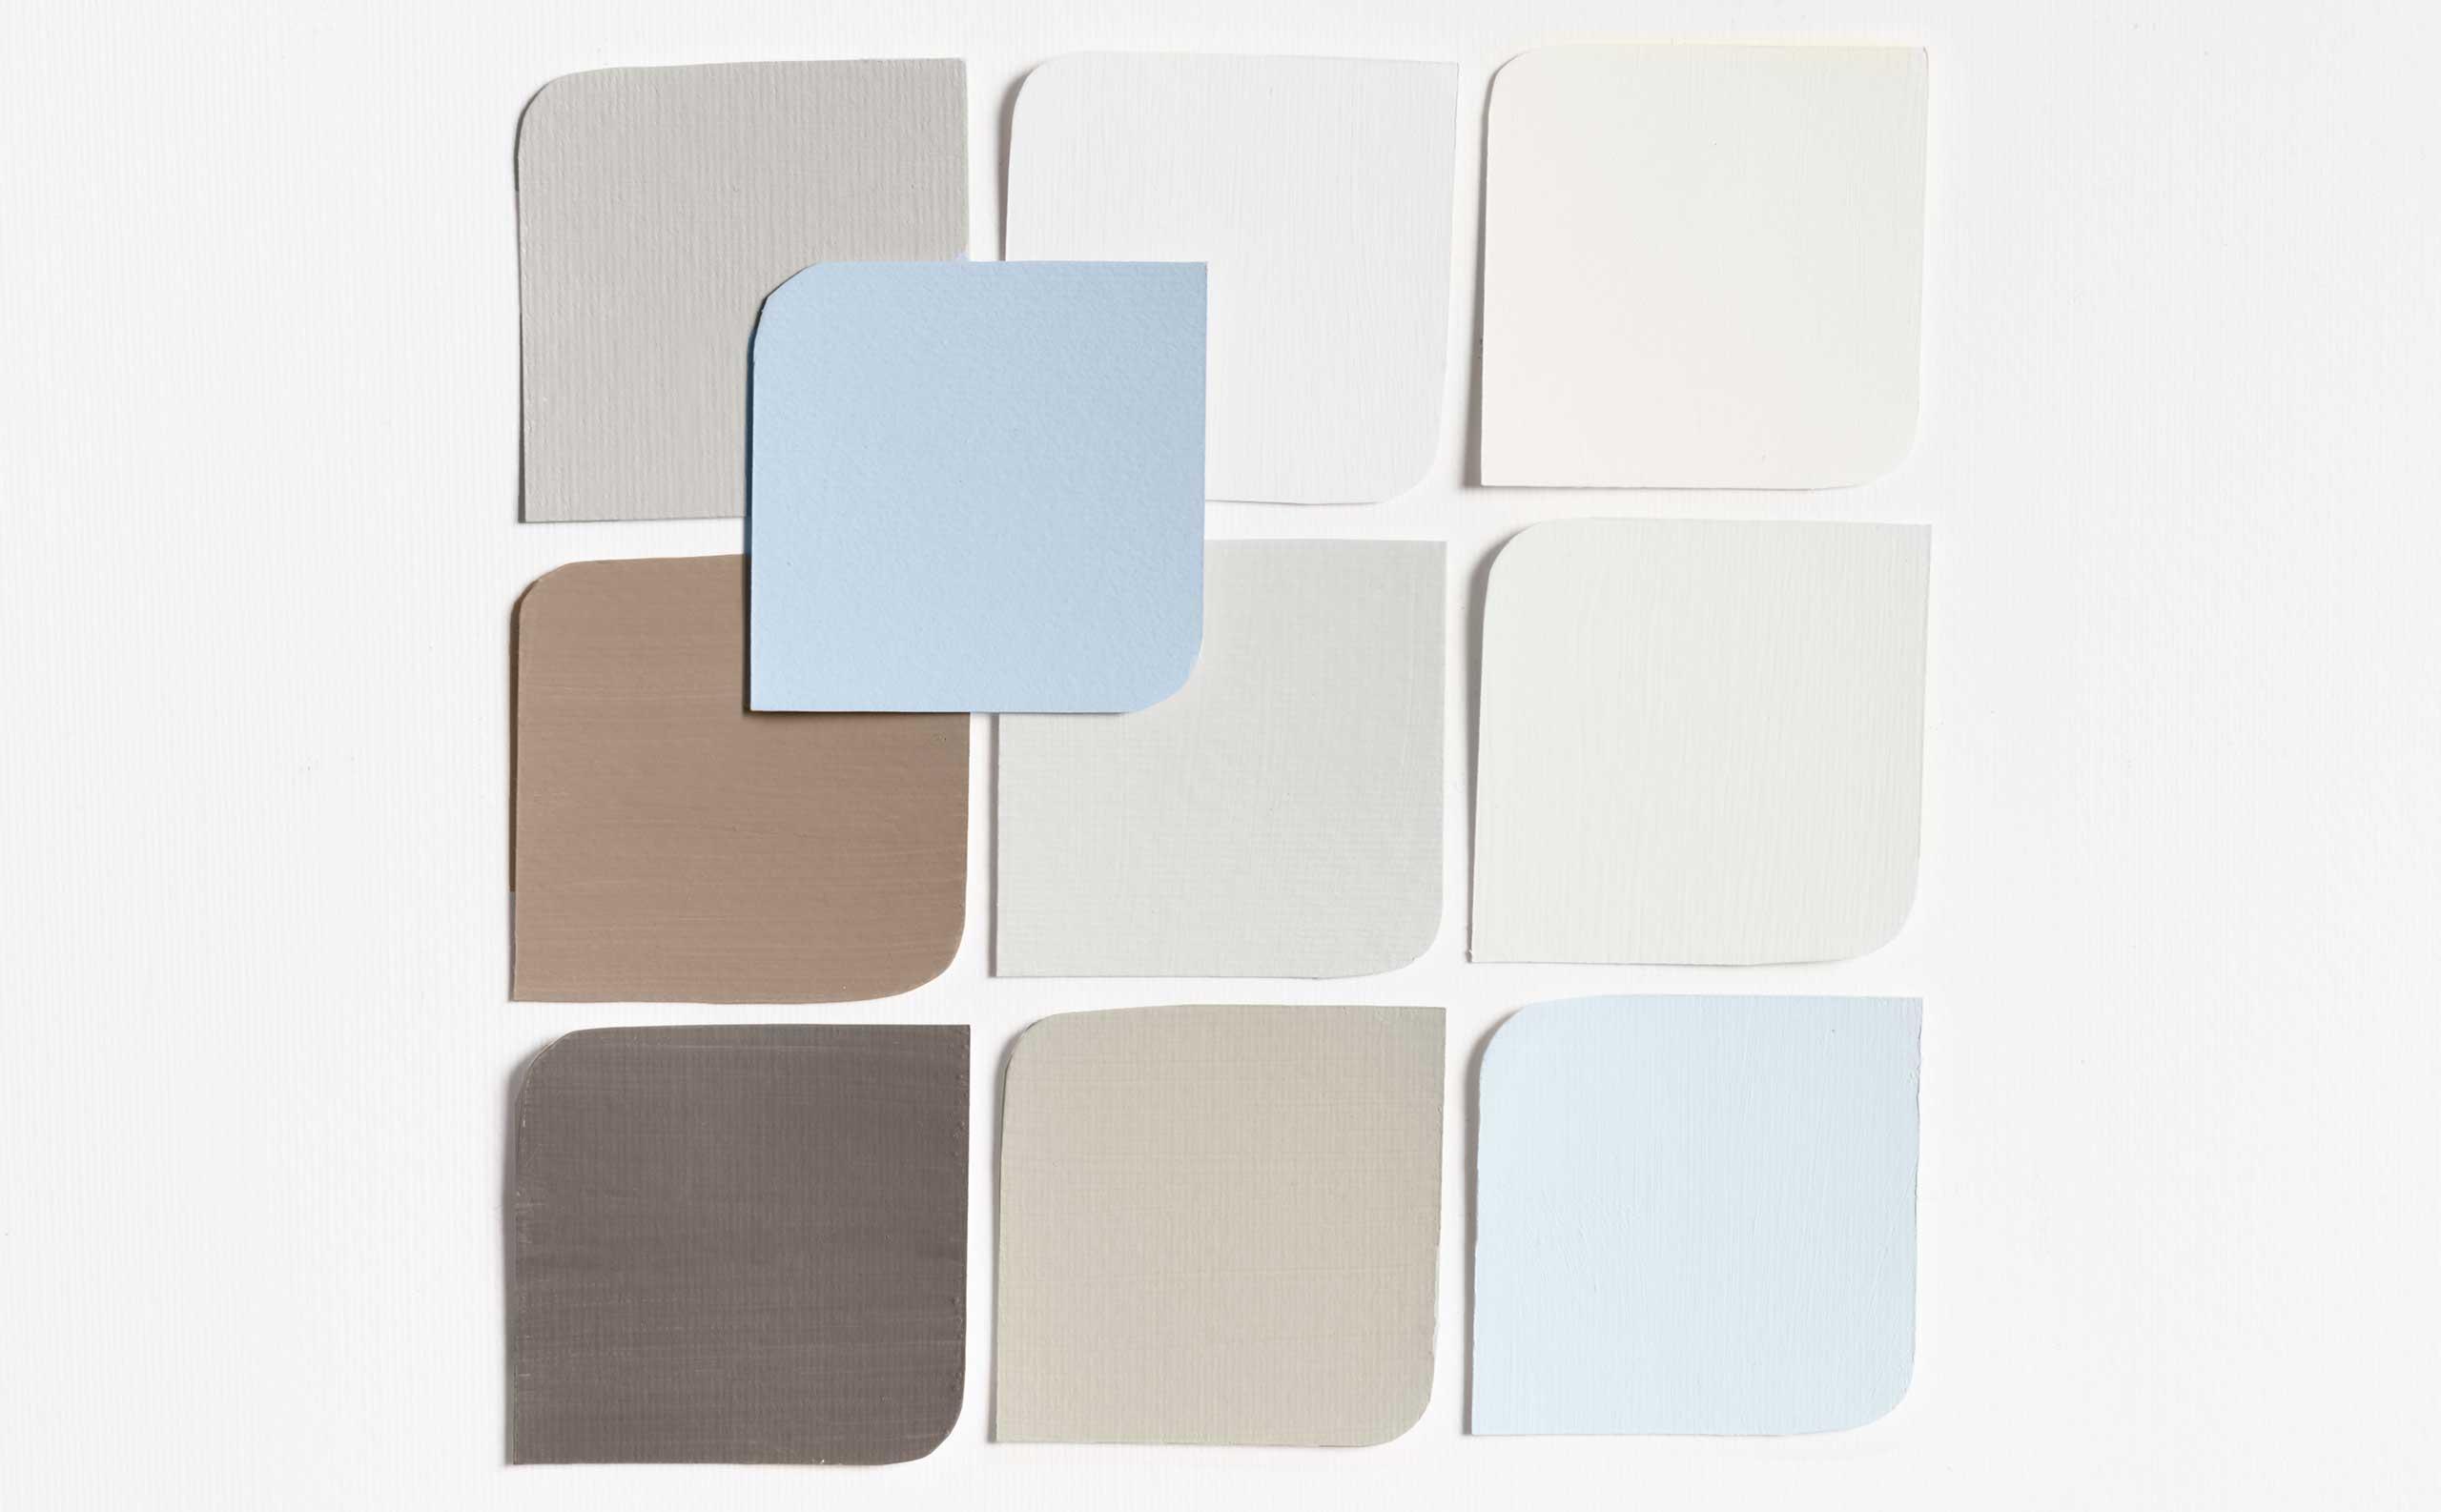 _Dulux-Colour-Futures-Colour-of-the-Year-2022-The-Salon-Colours-Inspiration-Global-215P